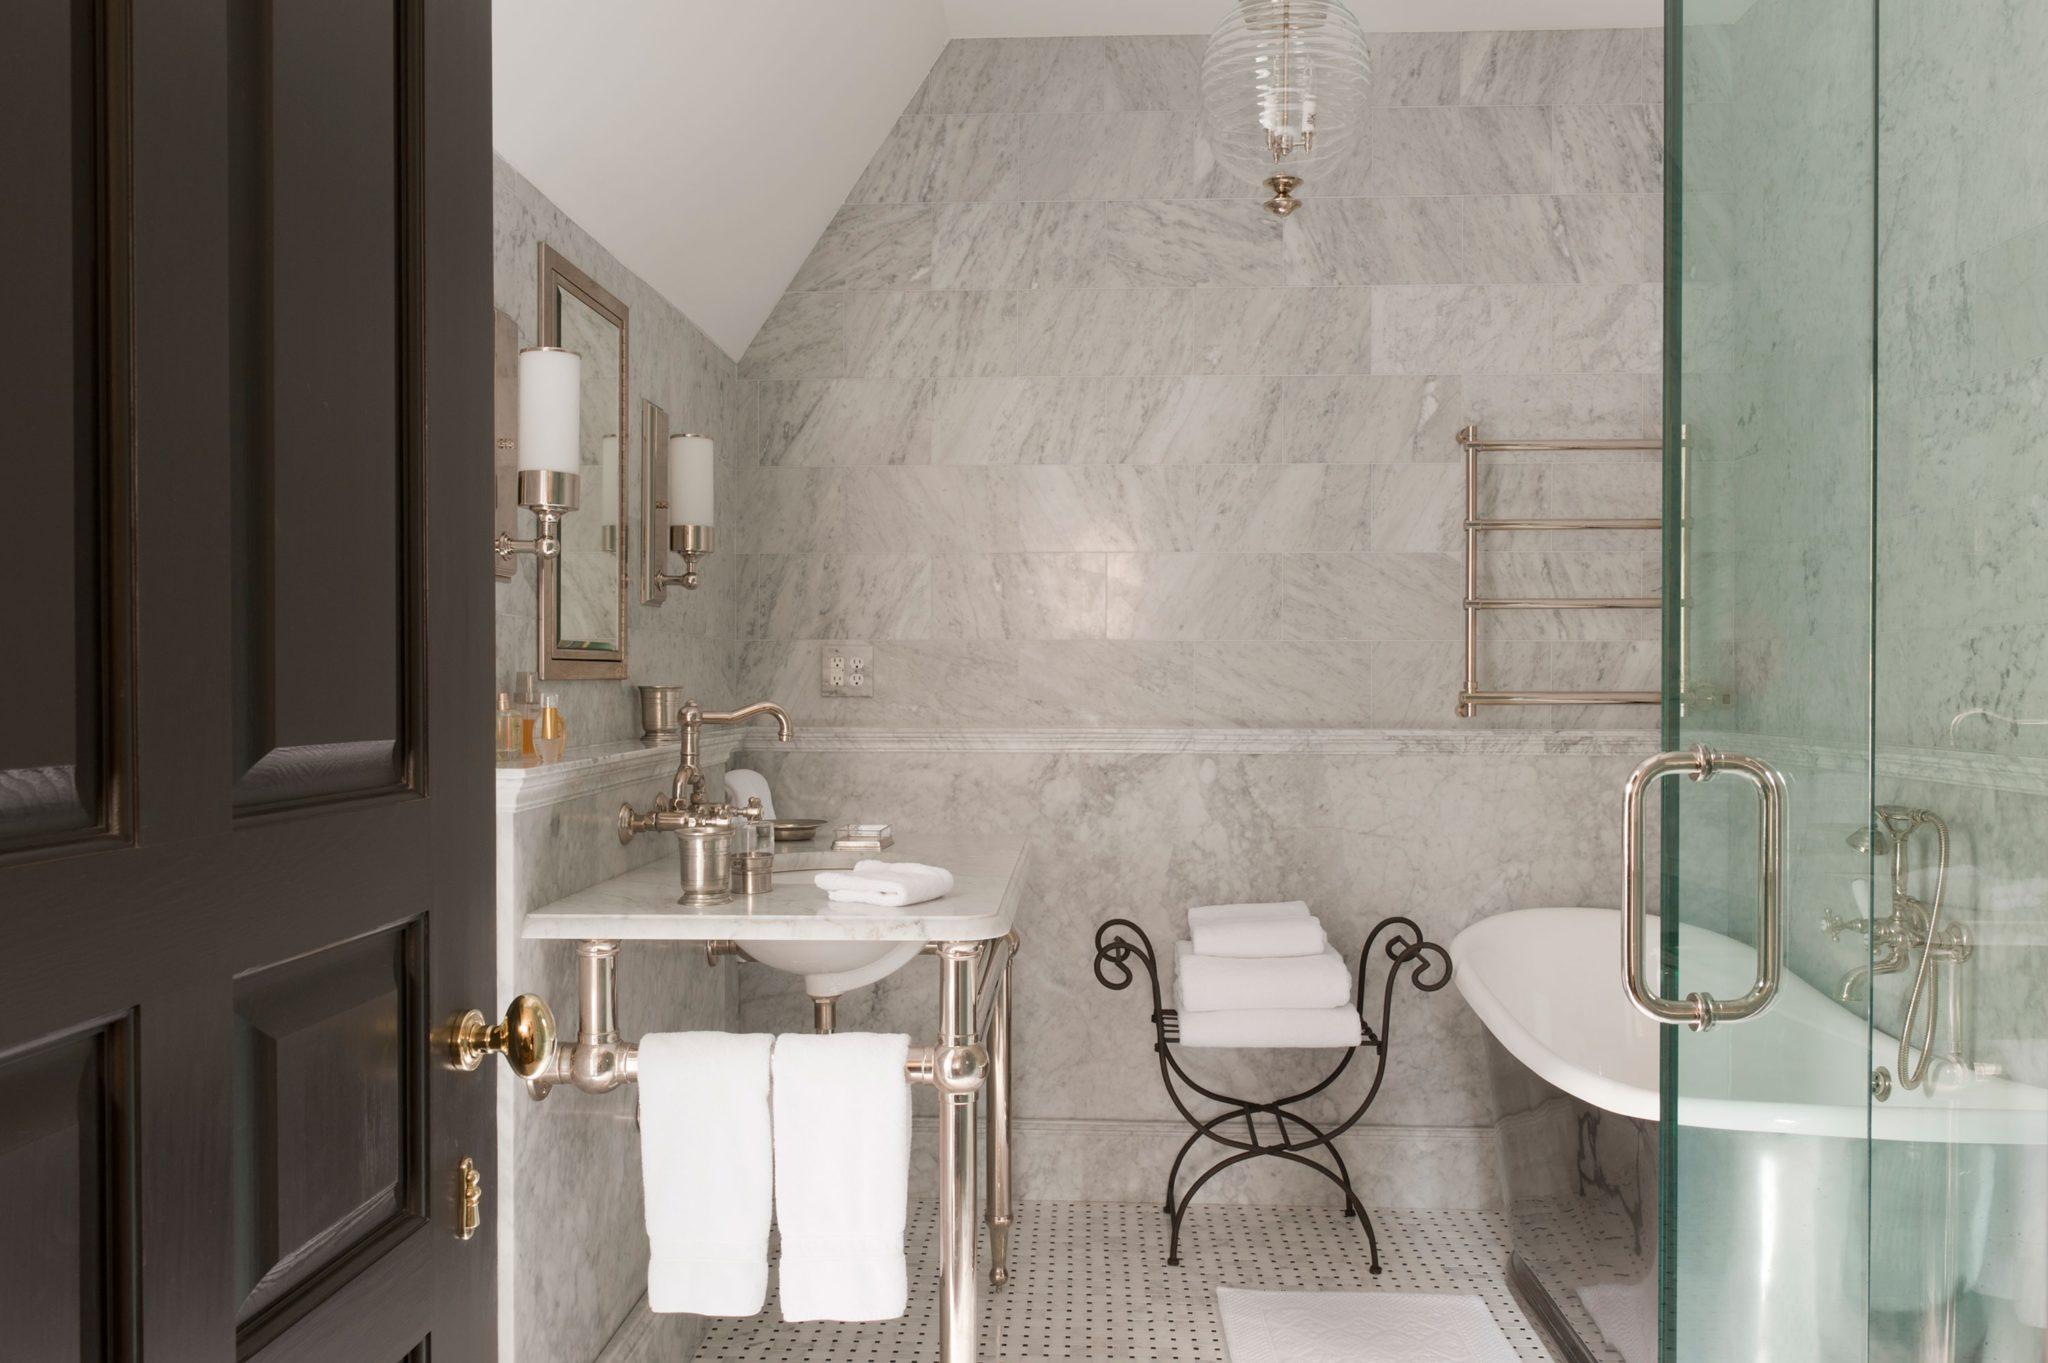 Interior design bySusan Bozeman Designs